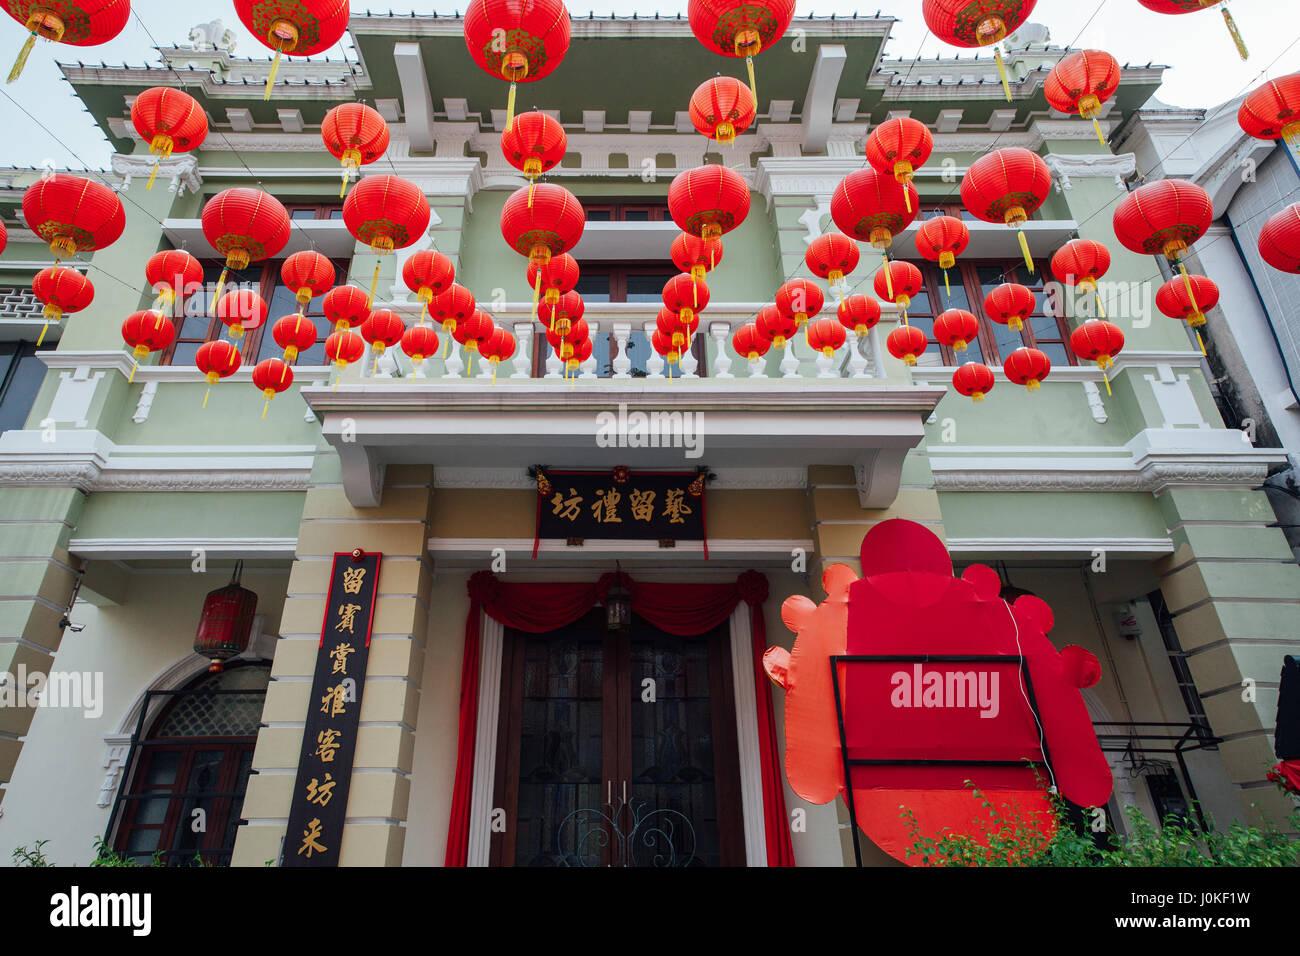 George Town, Malesia - 24 Marzo 2016: Yap Kongsi clan casa decorata con il cinese lanterne rosse, Armenian Street, Immagini Stock